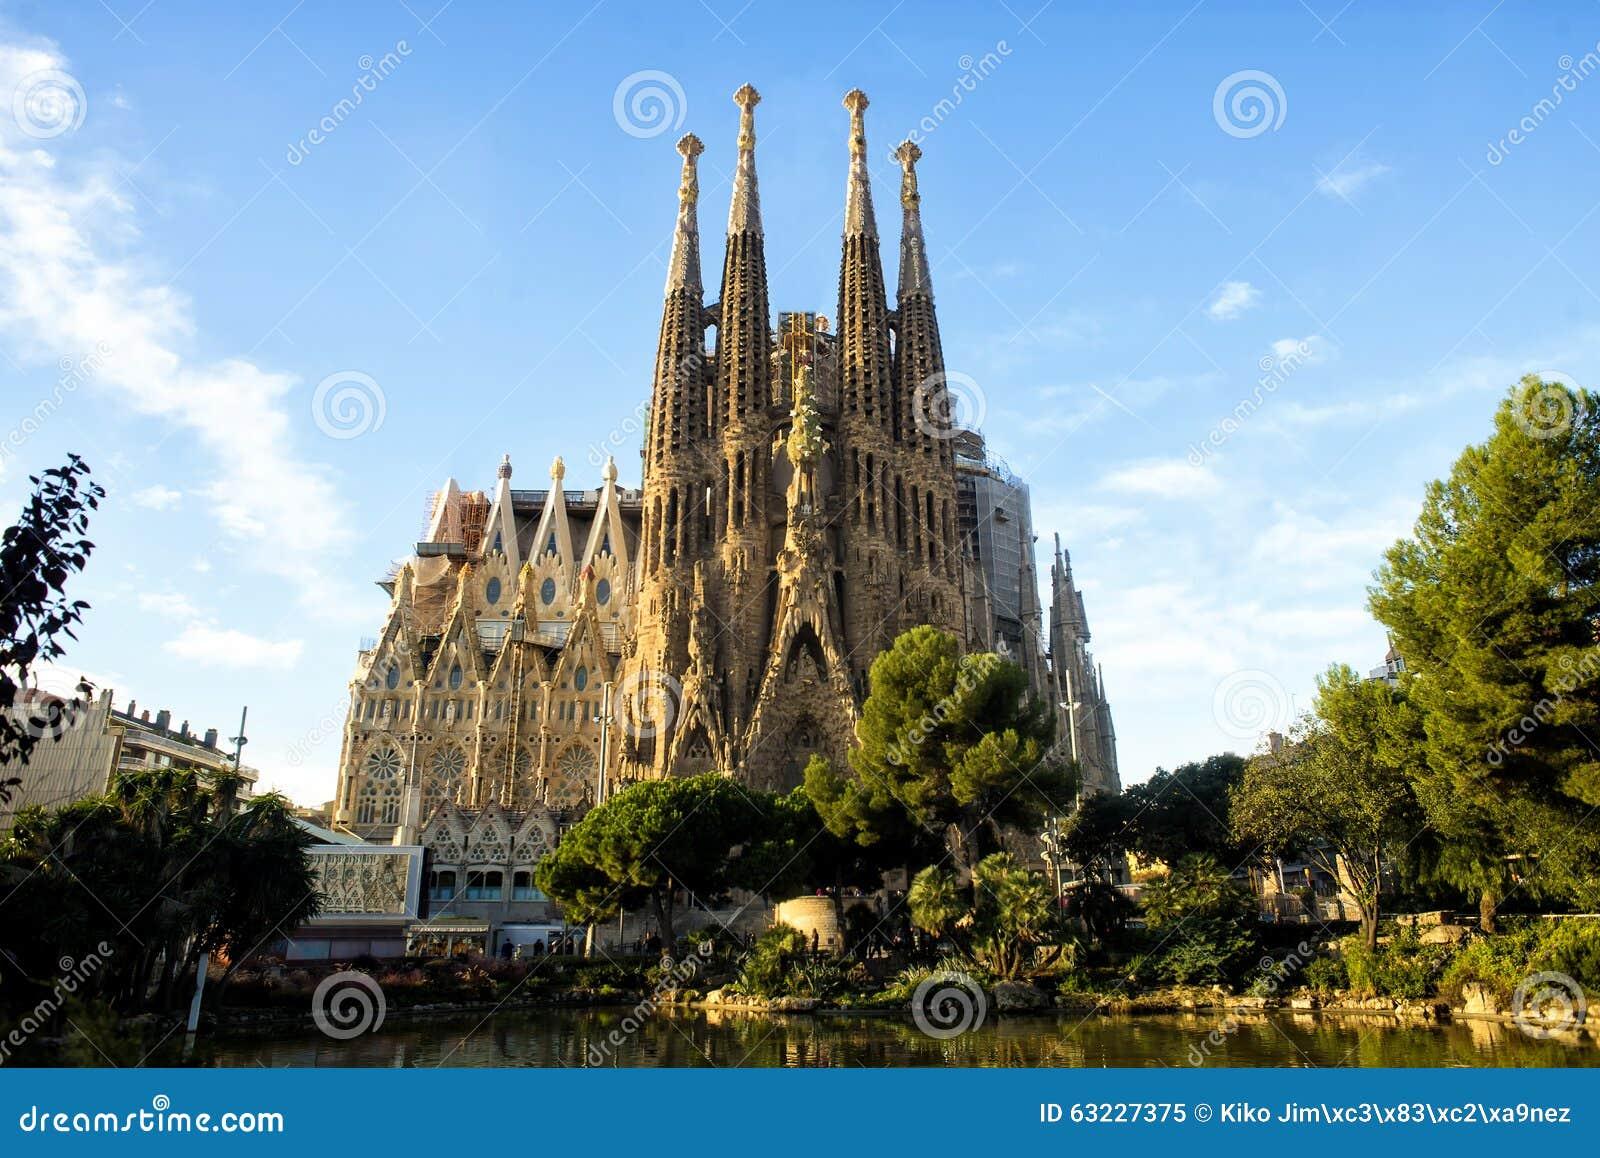 Sagrada Familia à Barcelone, Espagne